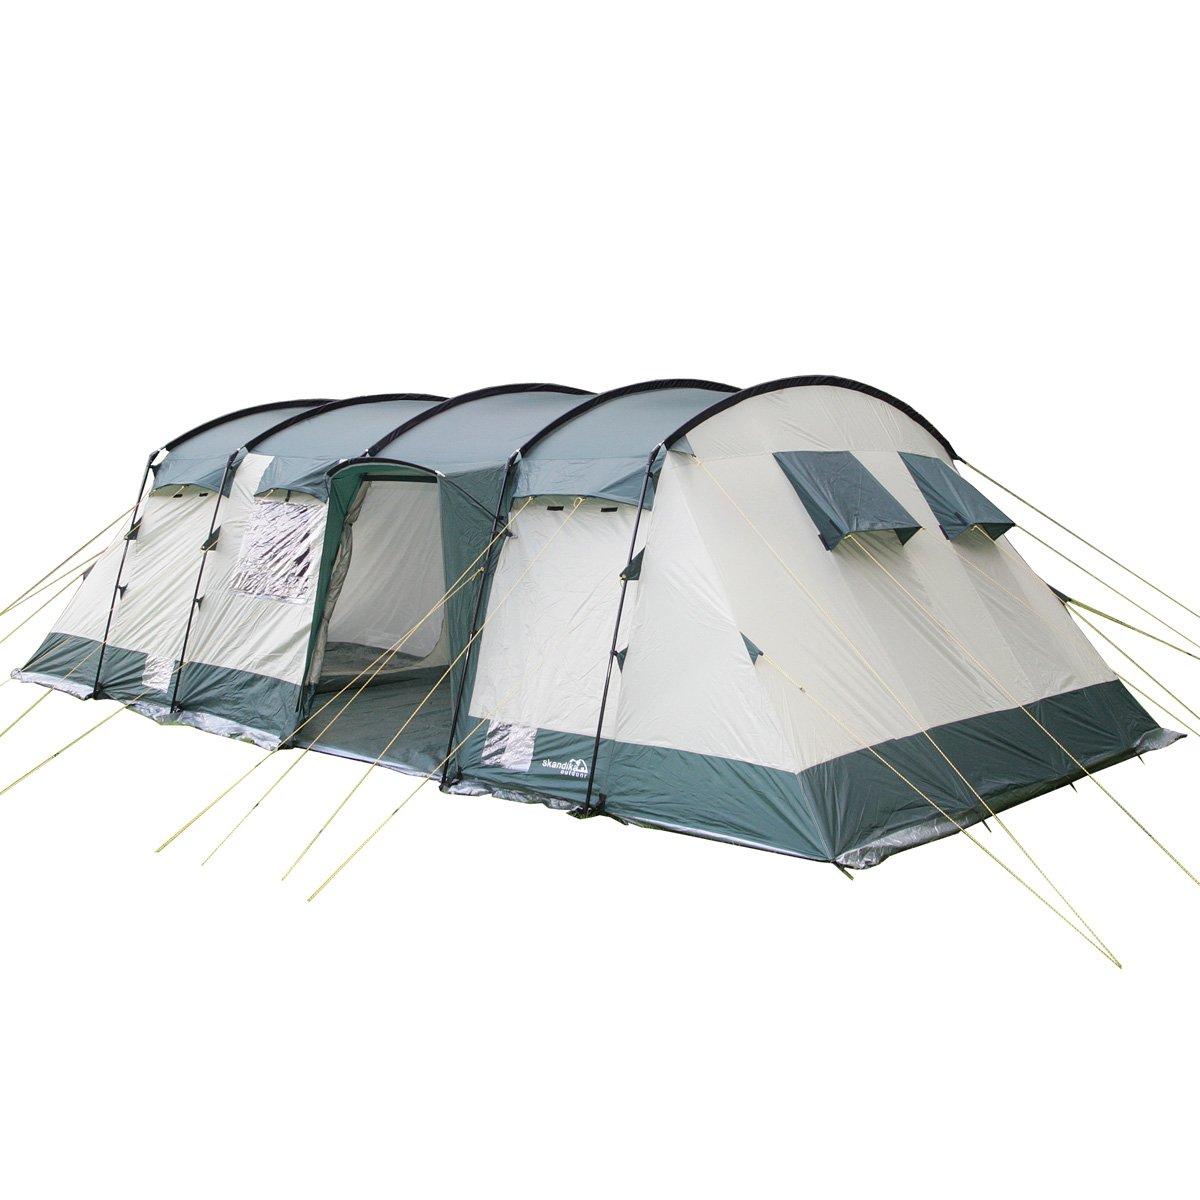 Skandika Unisex 1946 Hurricane Family Tent - Green 12 Person Amazon.co.uk Sports u0026 Outdoors  sc 1 st  Amazon UK & Skandika Unisex 1946 Hurricane Family Tent - Green 12 Person ...